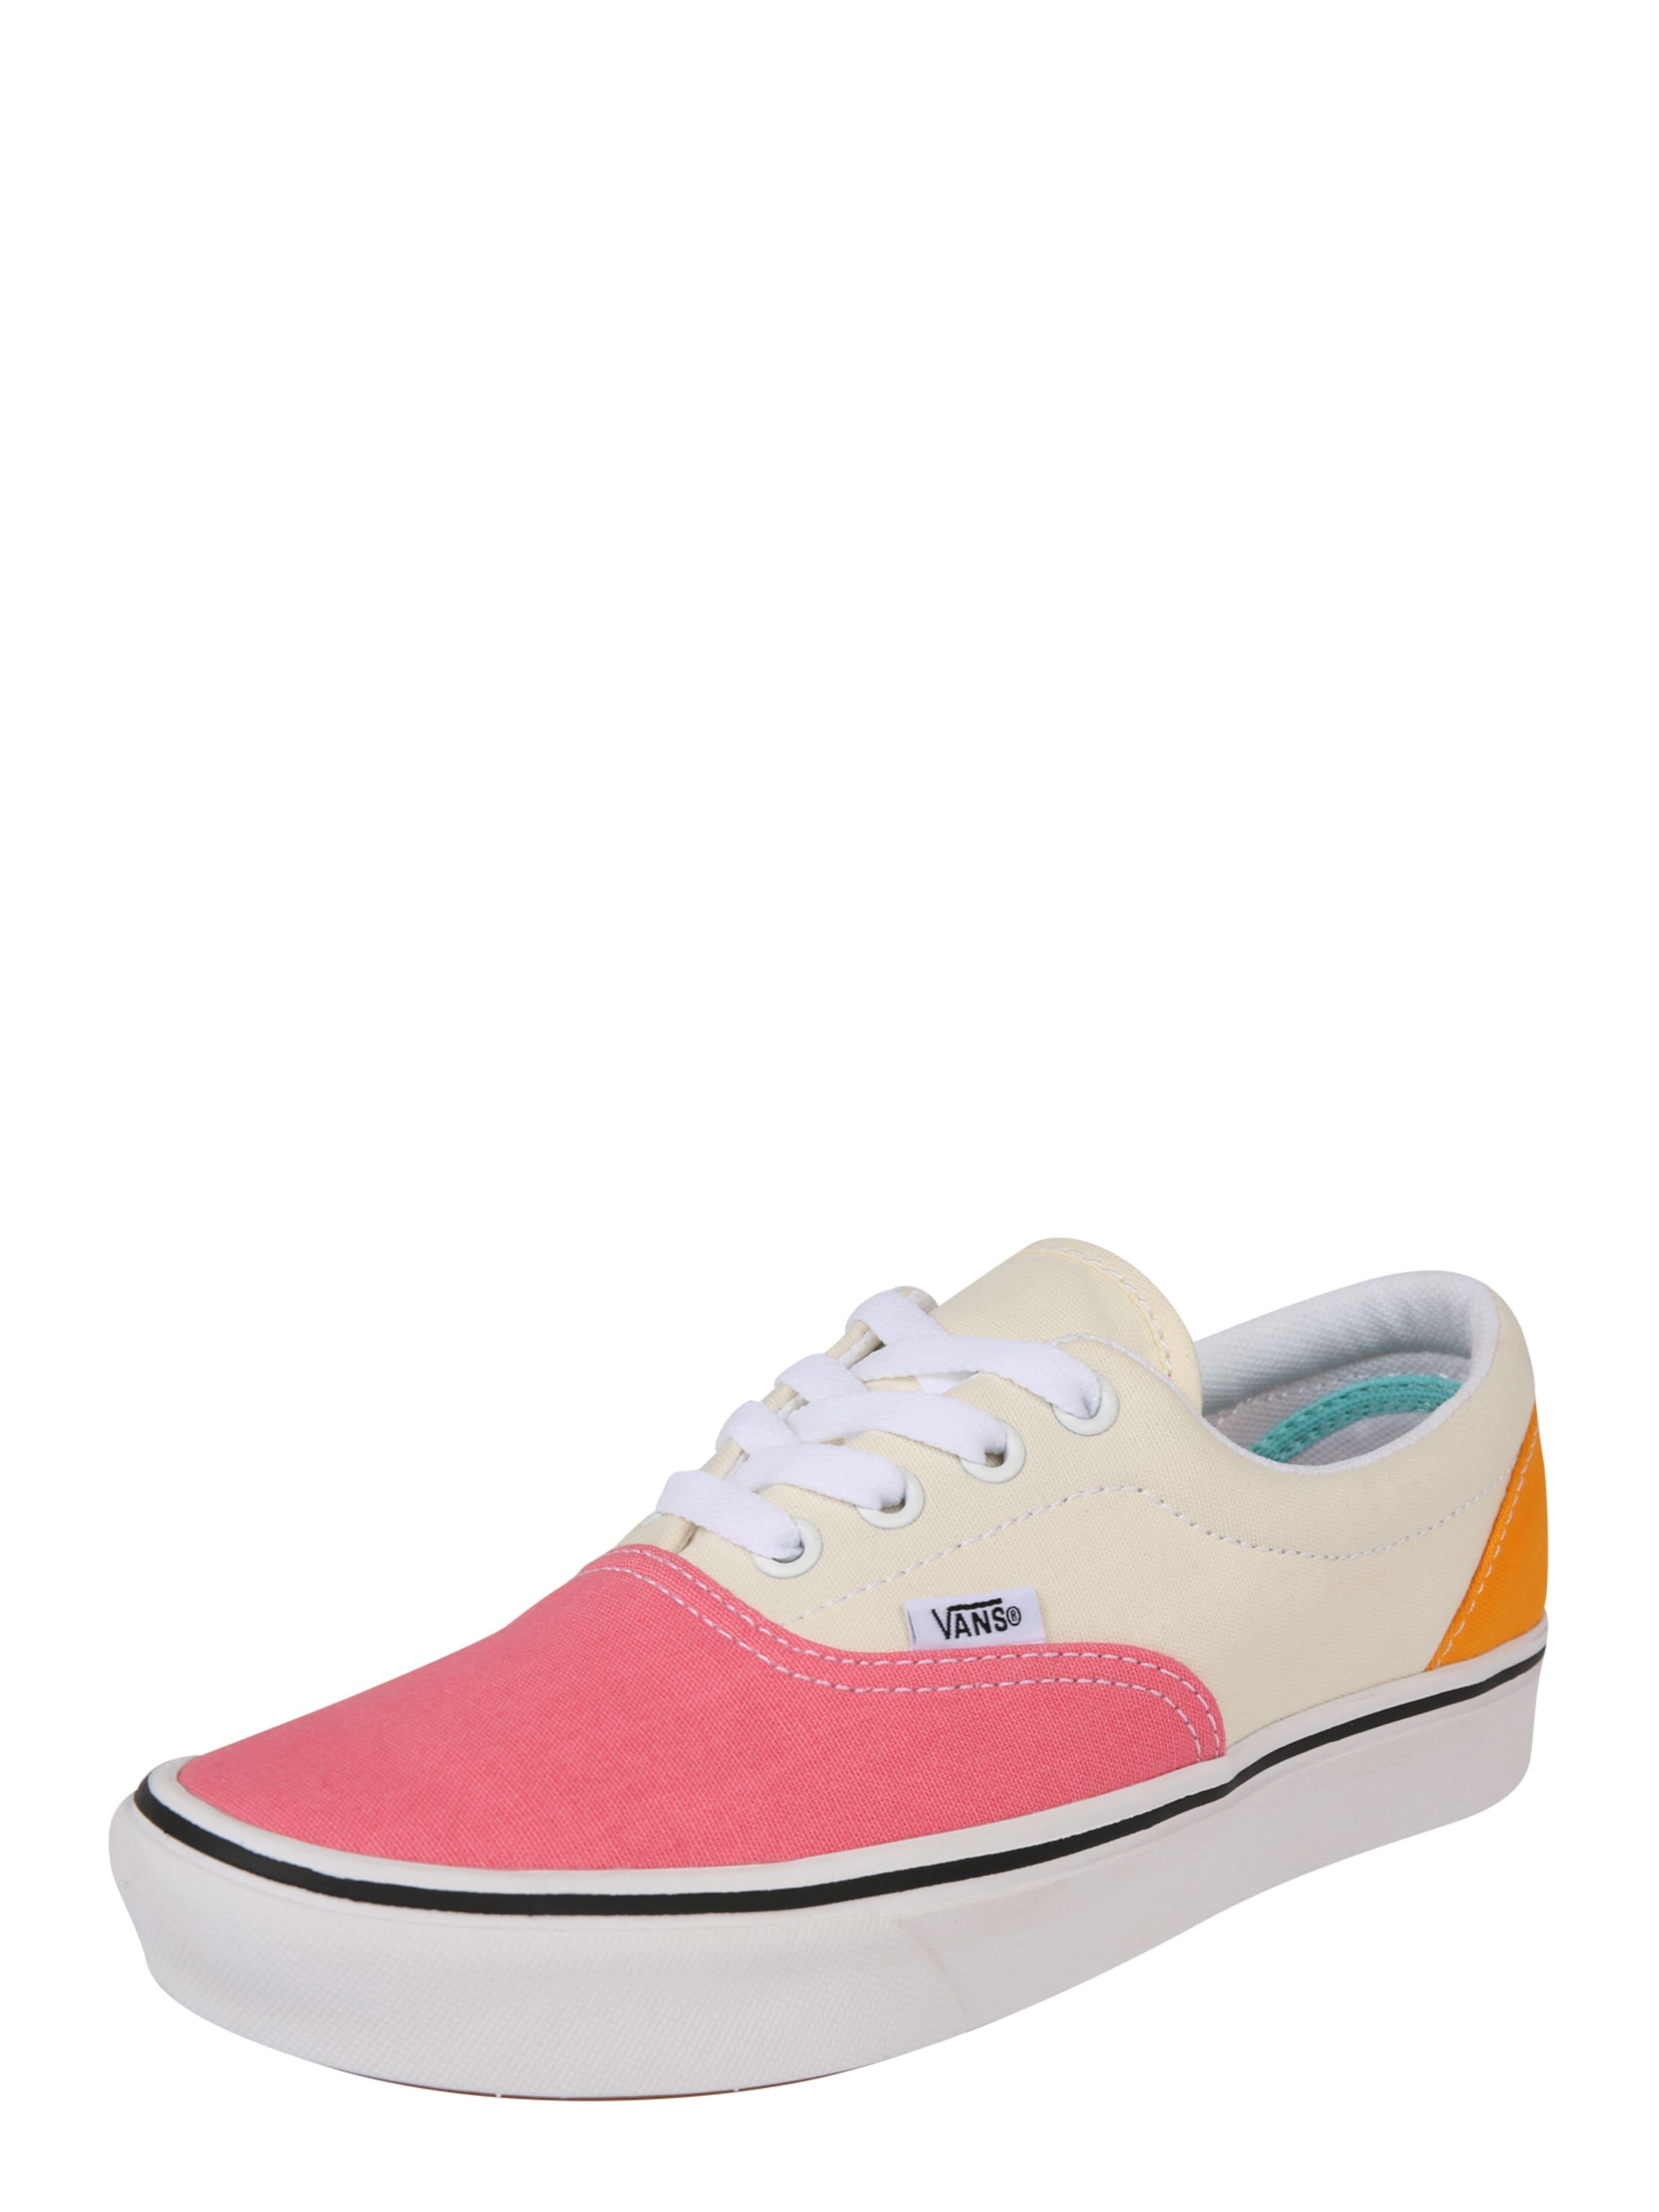 Comfycush Era' 'ua OrangePink Vans In Offwhite Sneaker c3AjL4S5Rq